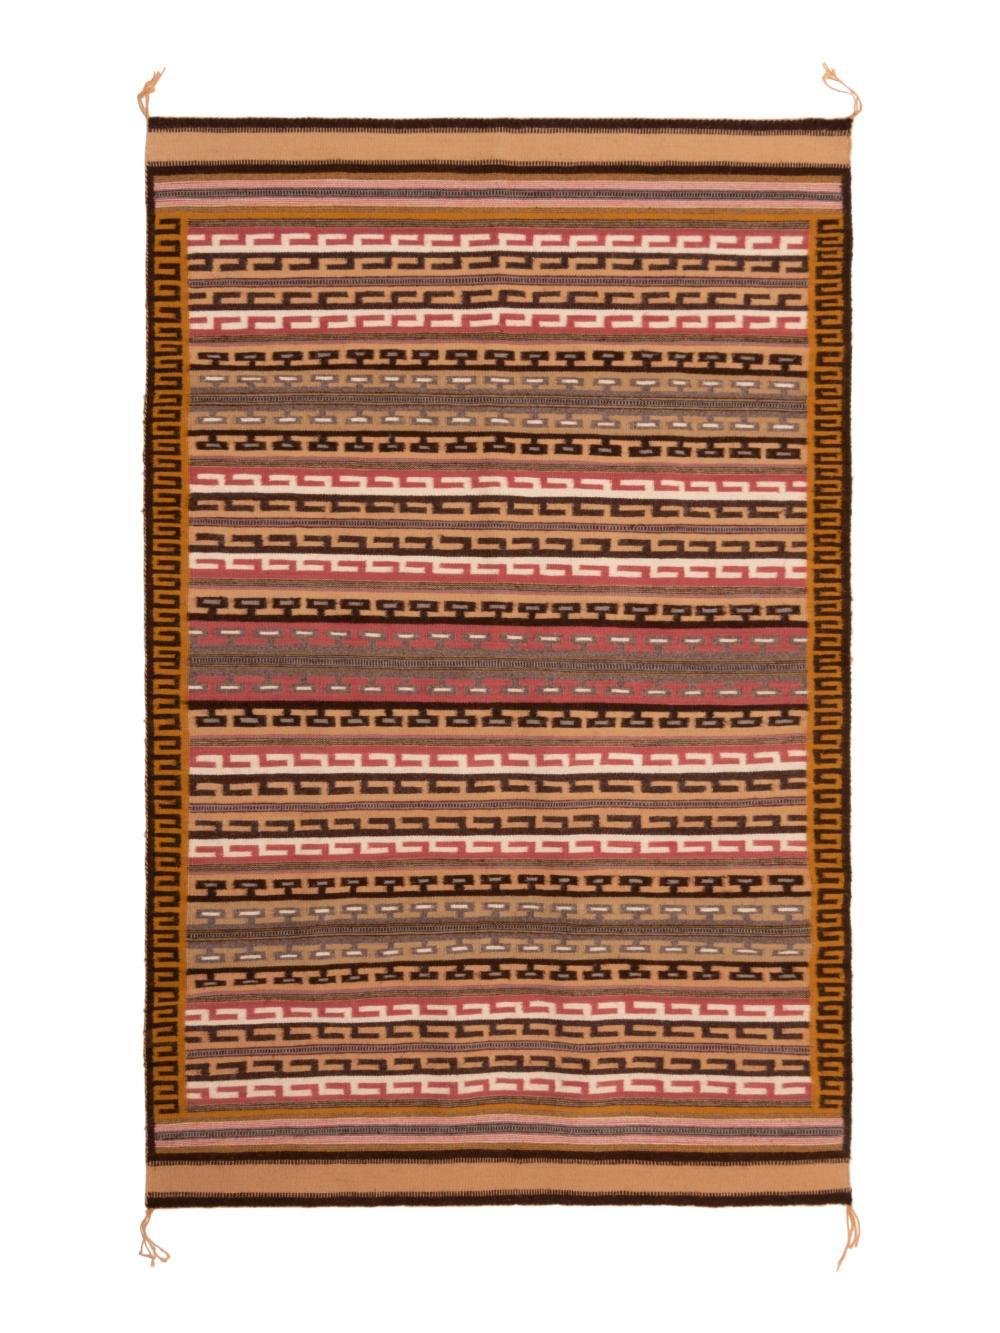 Mary Nez (Dine, 20th century) Navajo Wide Ruins Weaving